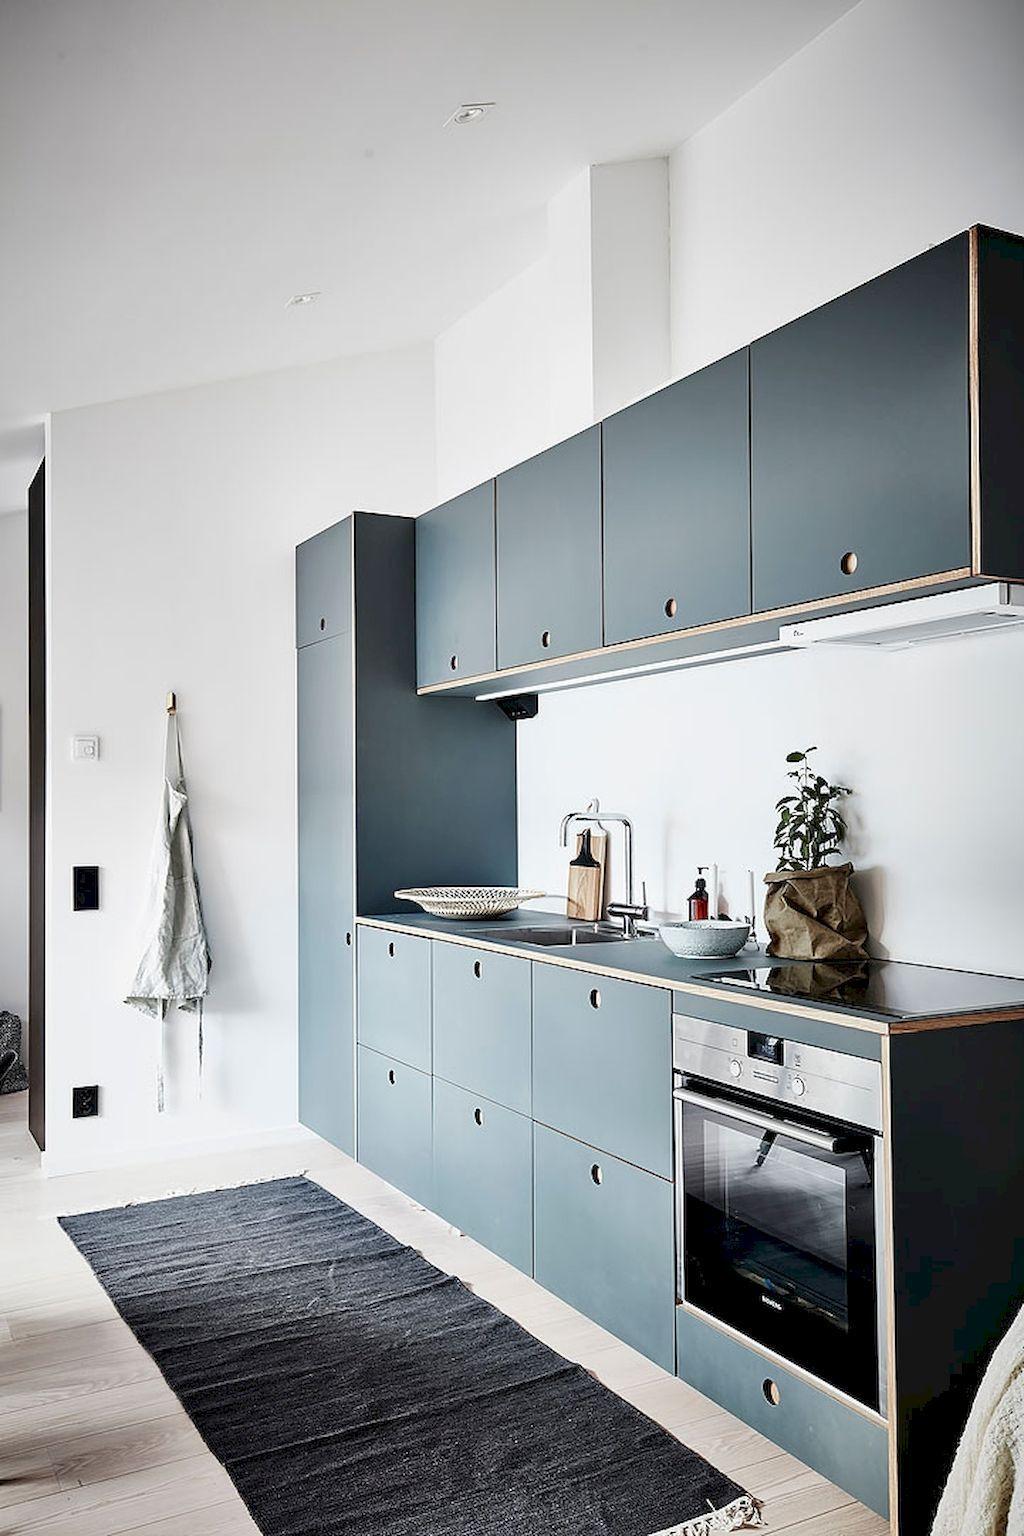 80 Small Kitchen Design & Organization Ideas | Kitchens, Kitchen ...